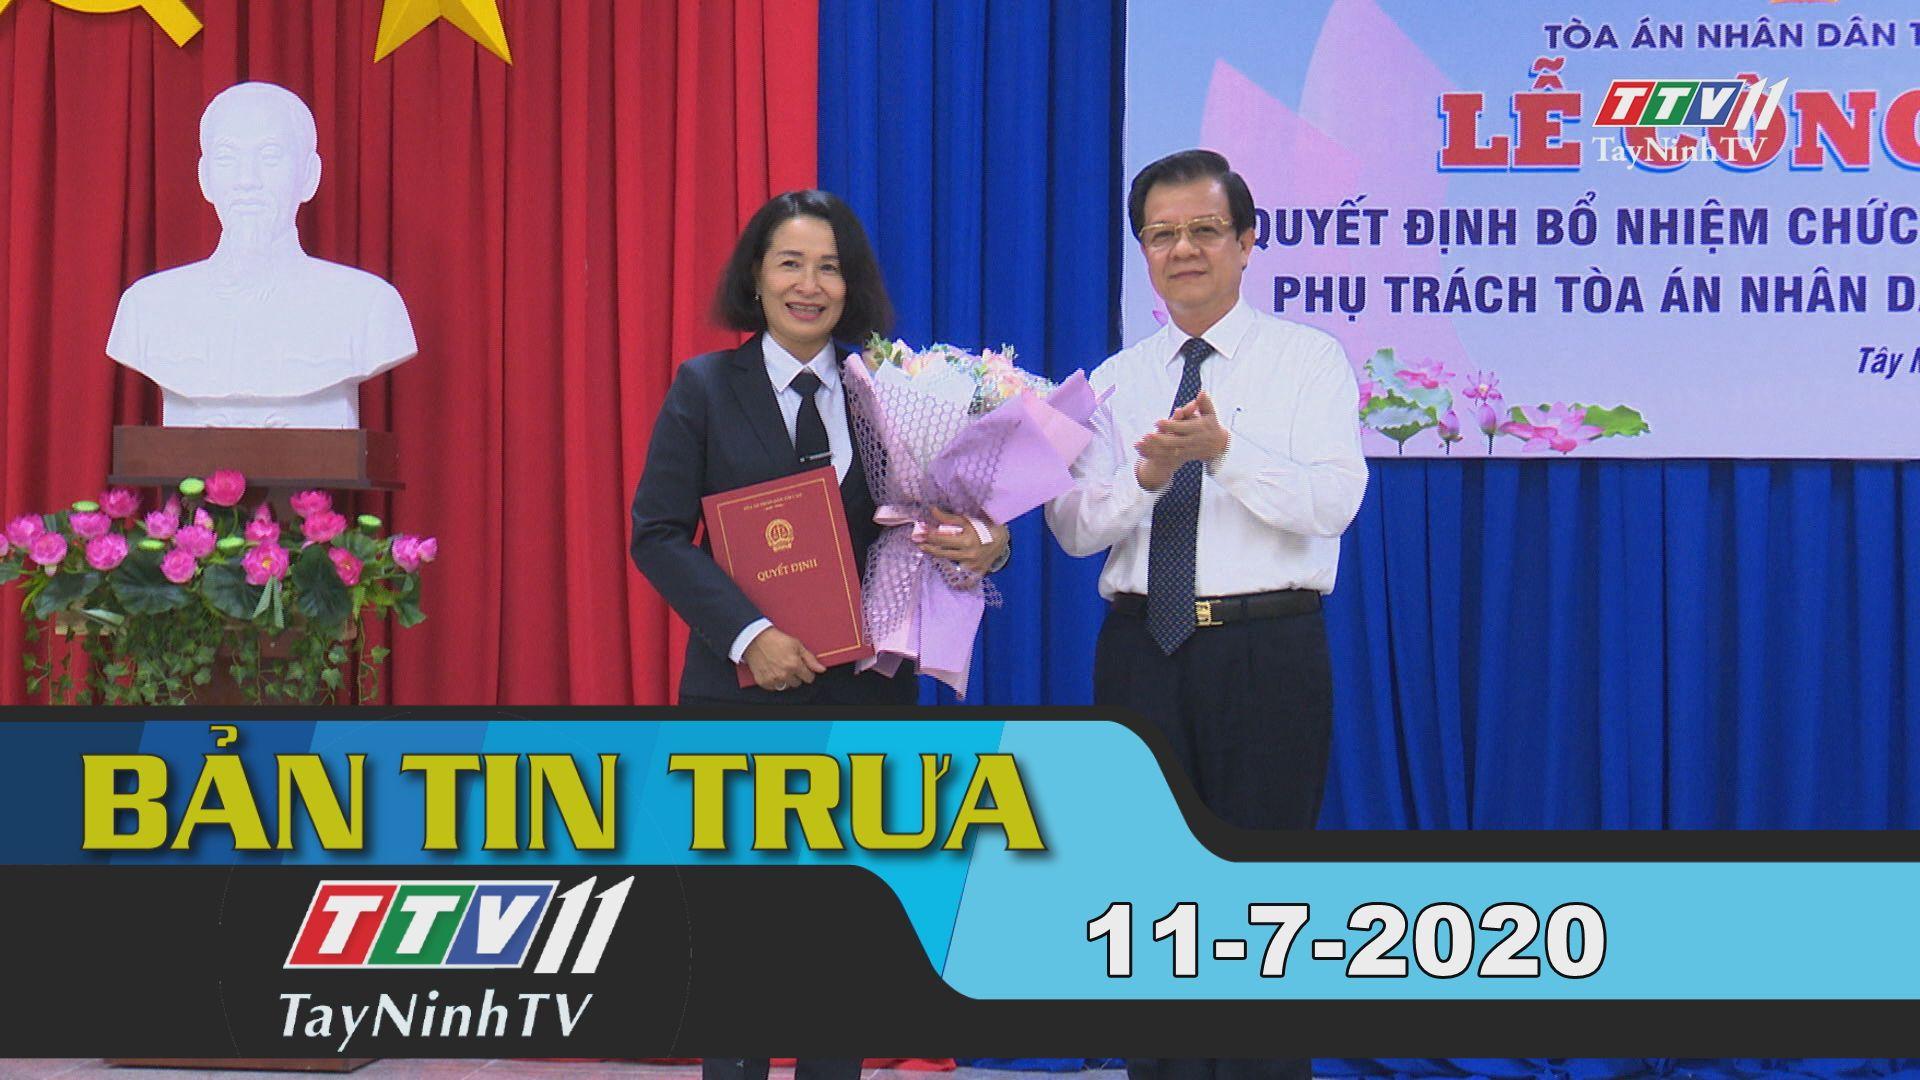 Bản tin trưa 11-7-2020 | Tin tức hôm nay | TayNinhTV